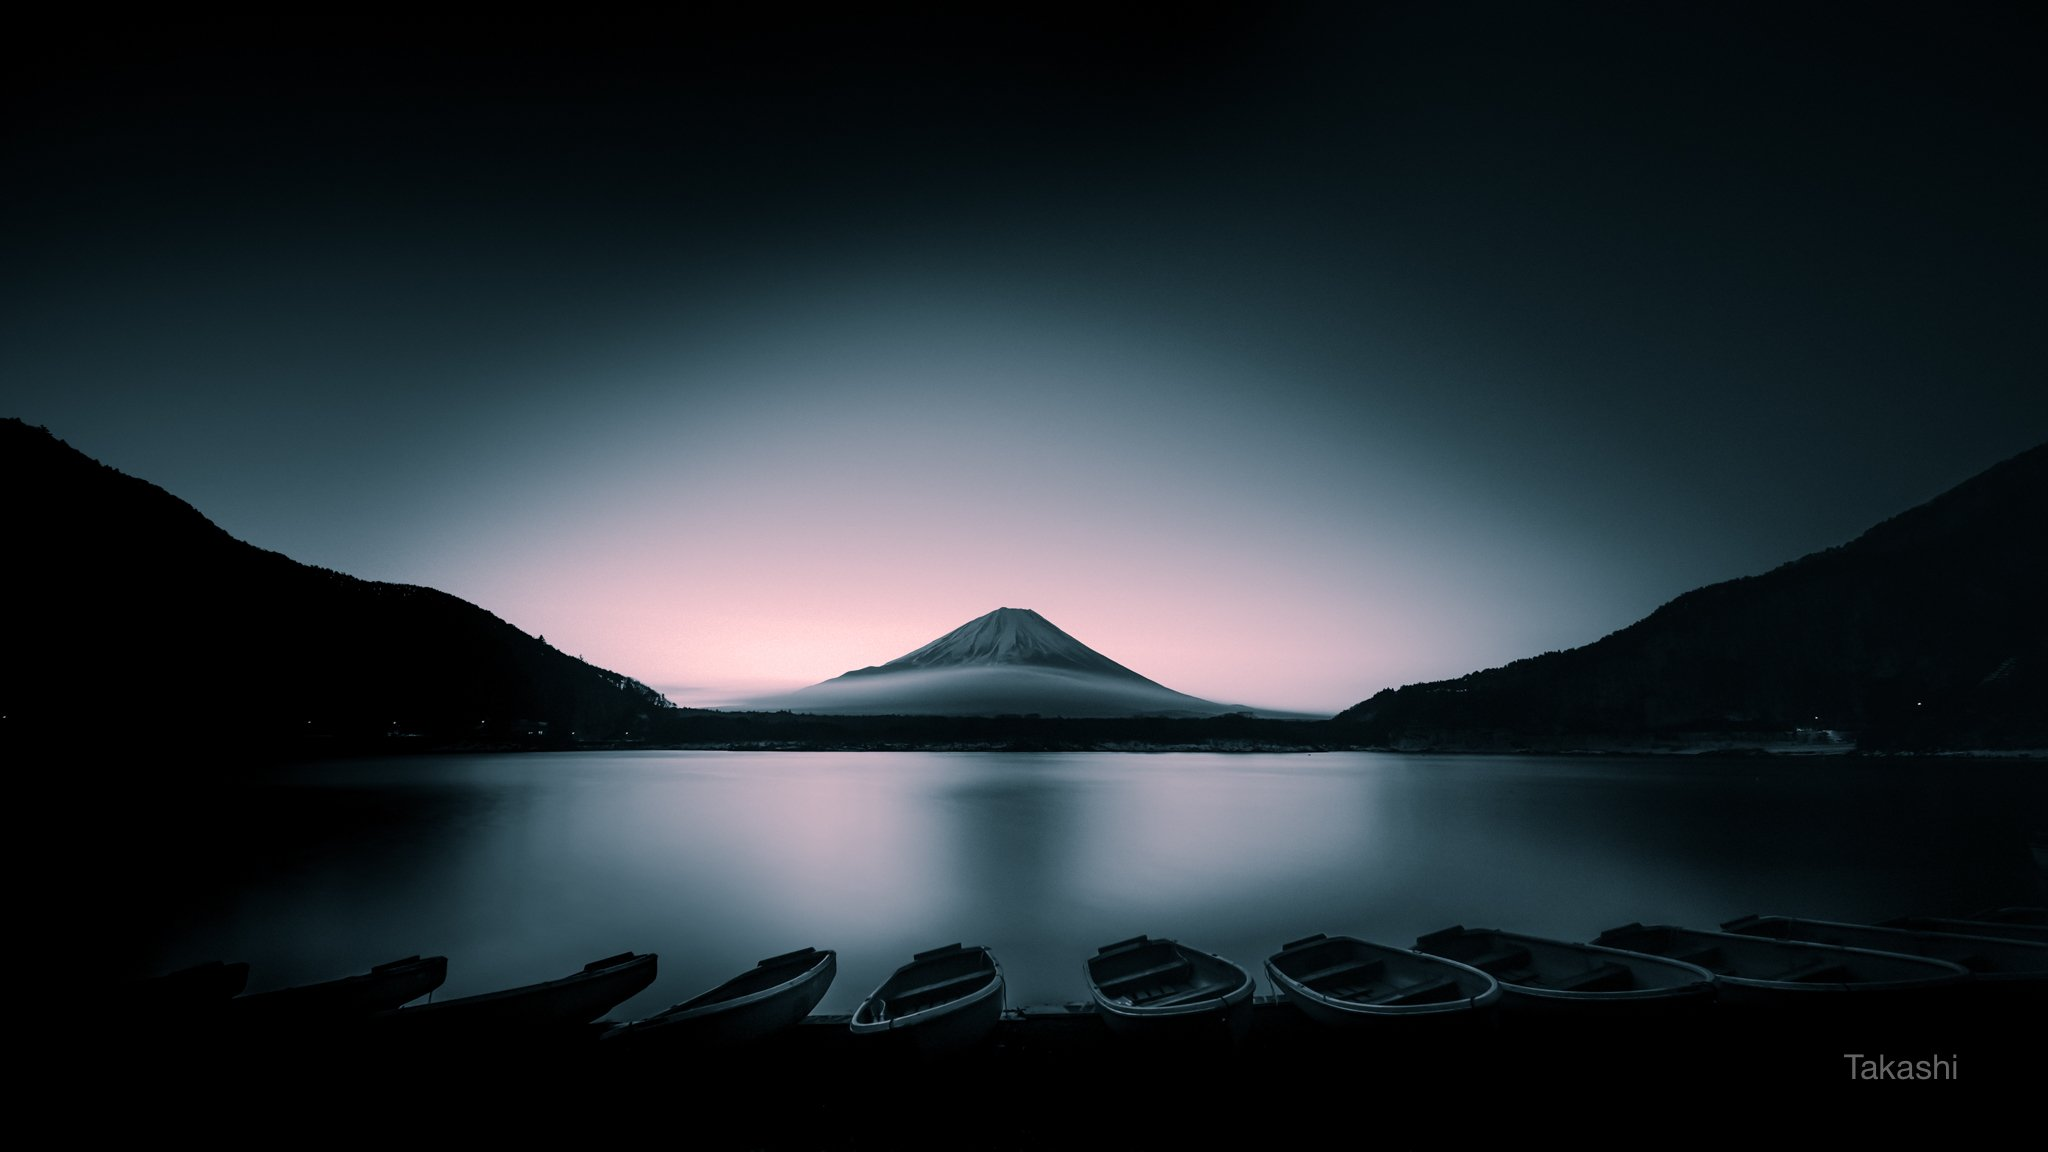 Fuji,Japan,mountain,lake,water,boat,sunrise,dawn,pink,green,beautiful,amazing,wonderful,, Takashi